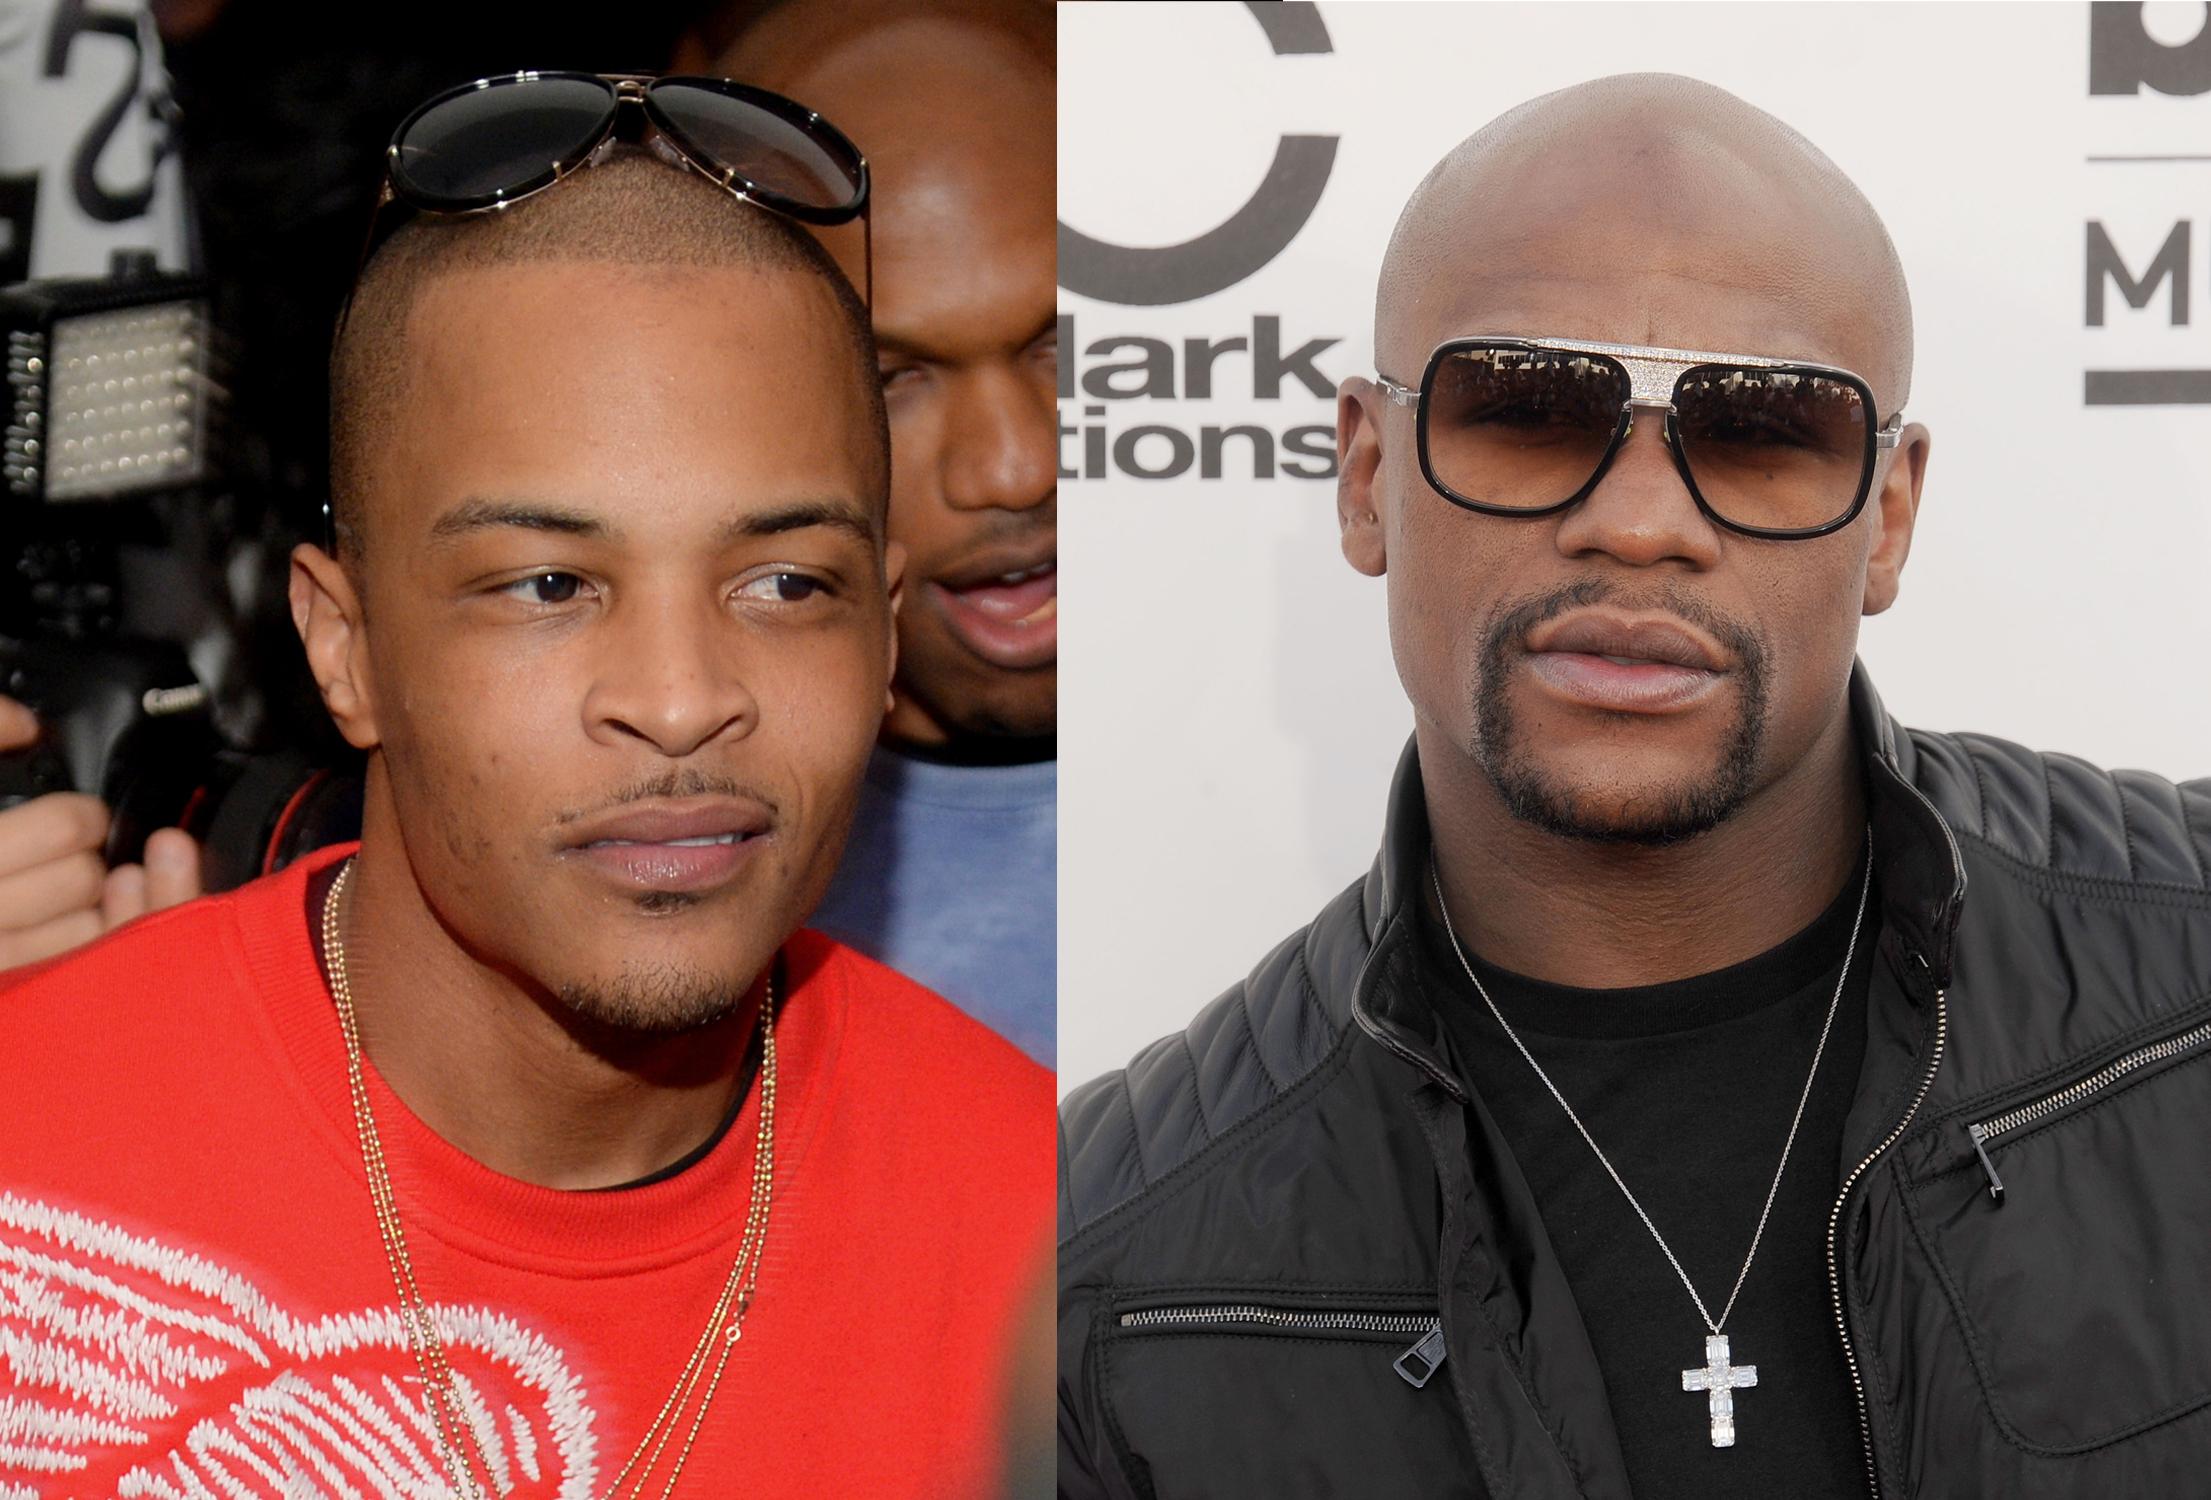 Left: rap artist T.I.; right: professional boxer Floyd Mayweather, Jr.